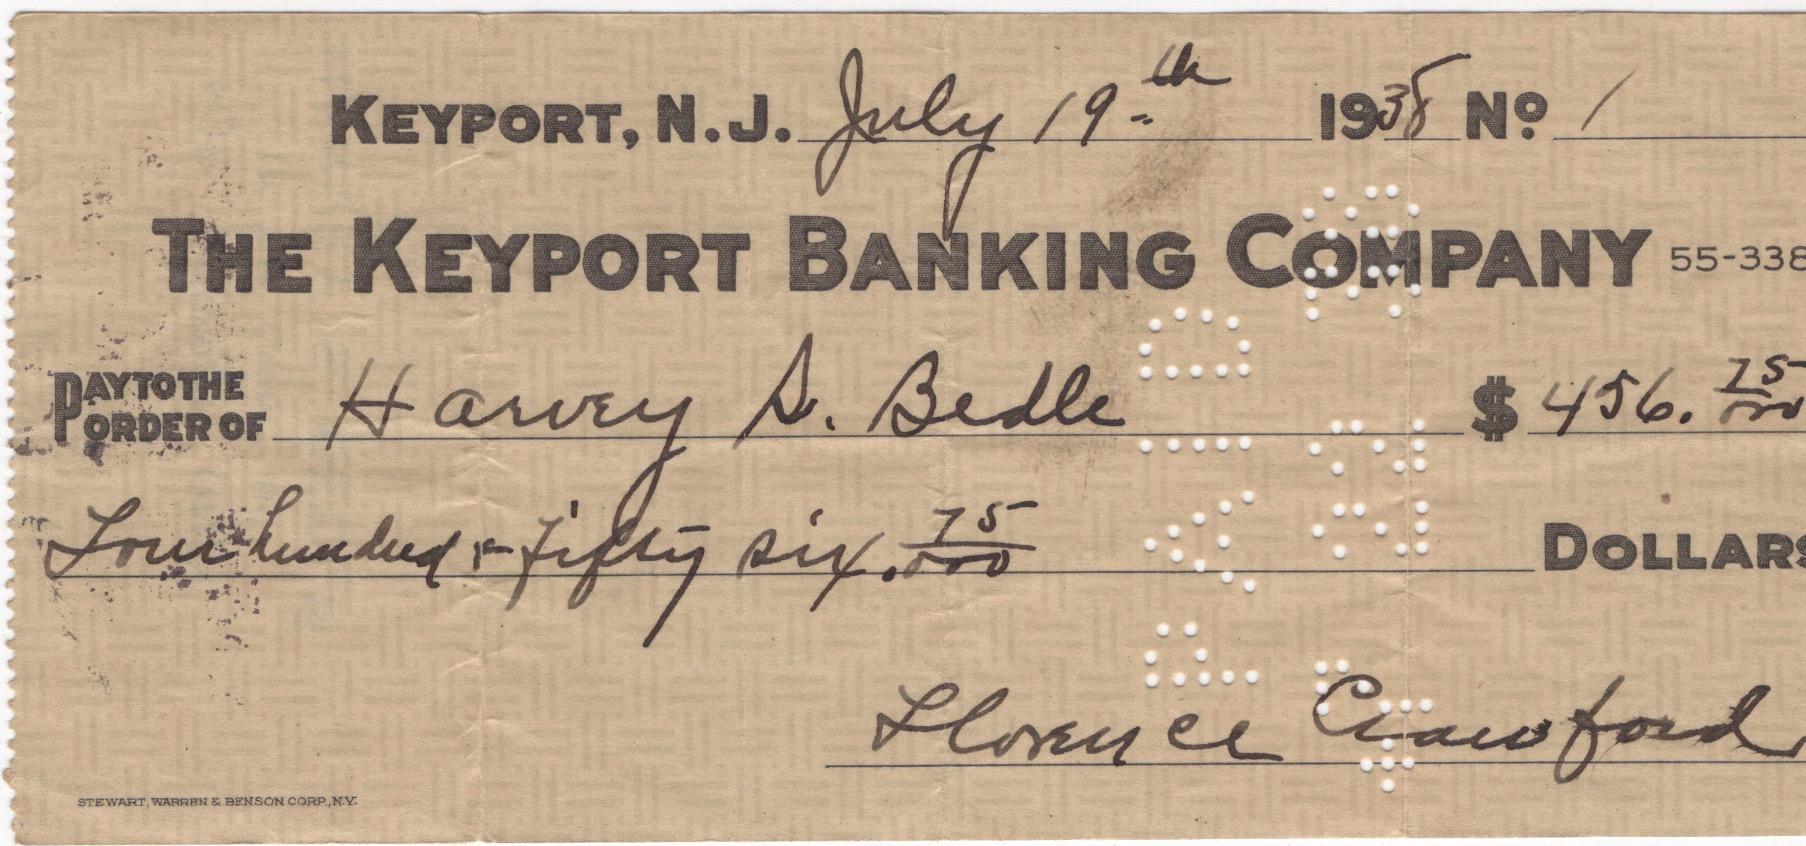 Harvey S. Bedle Check